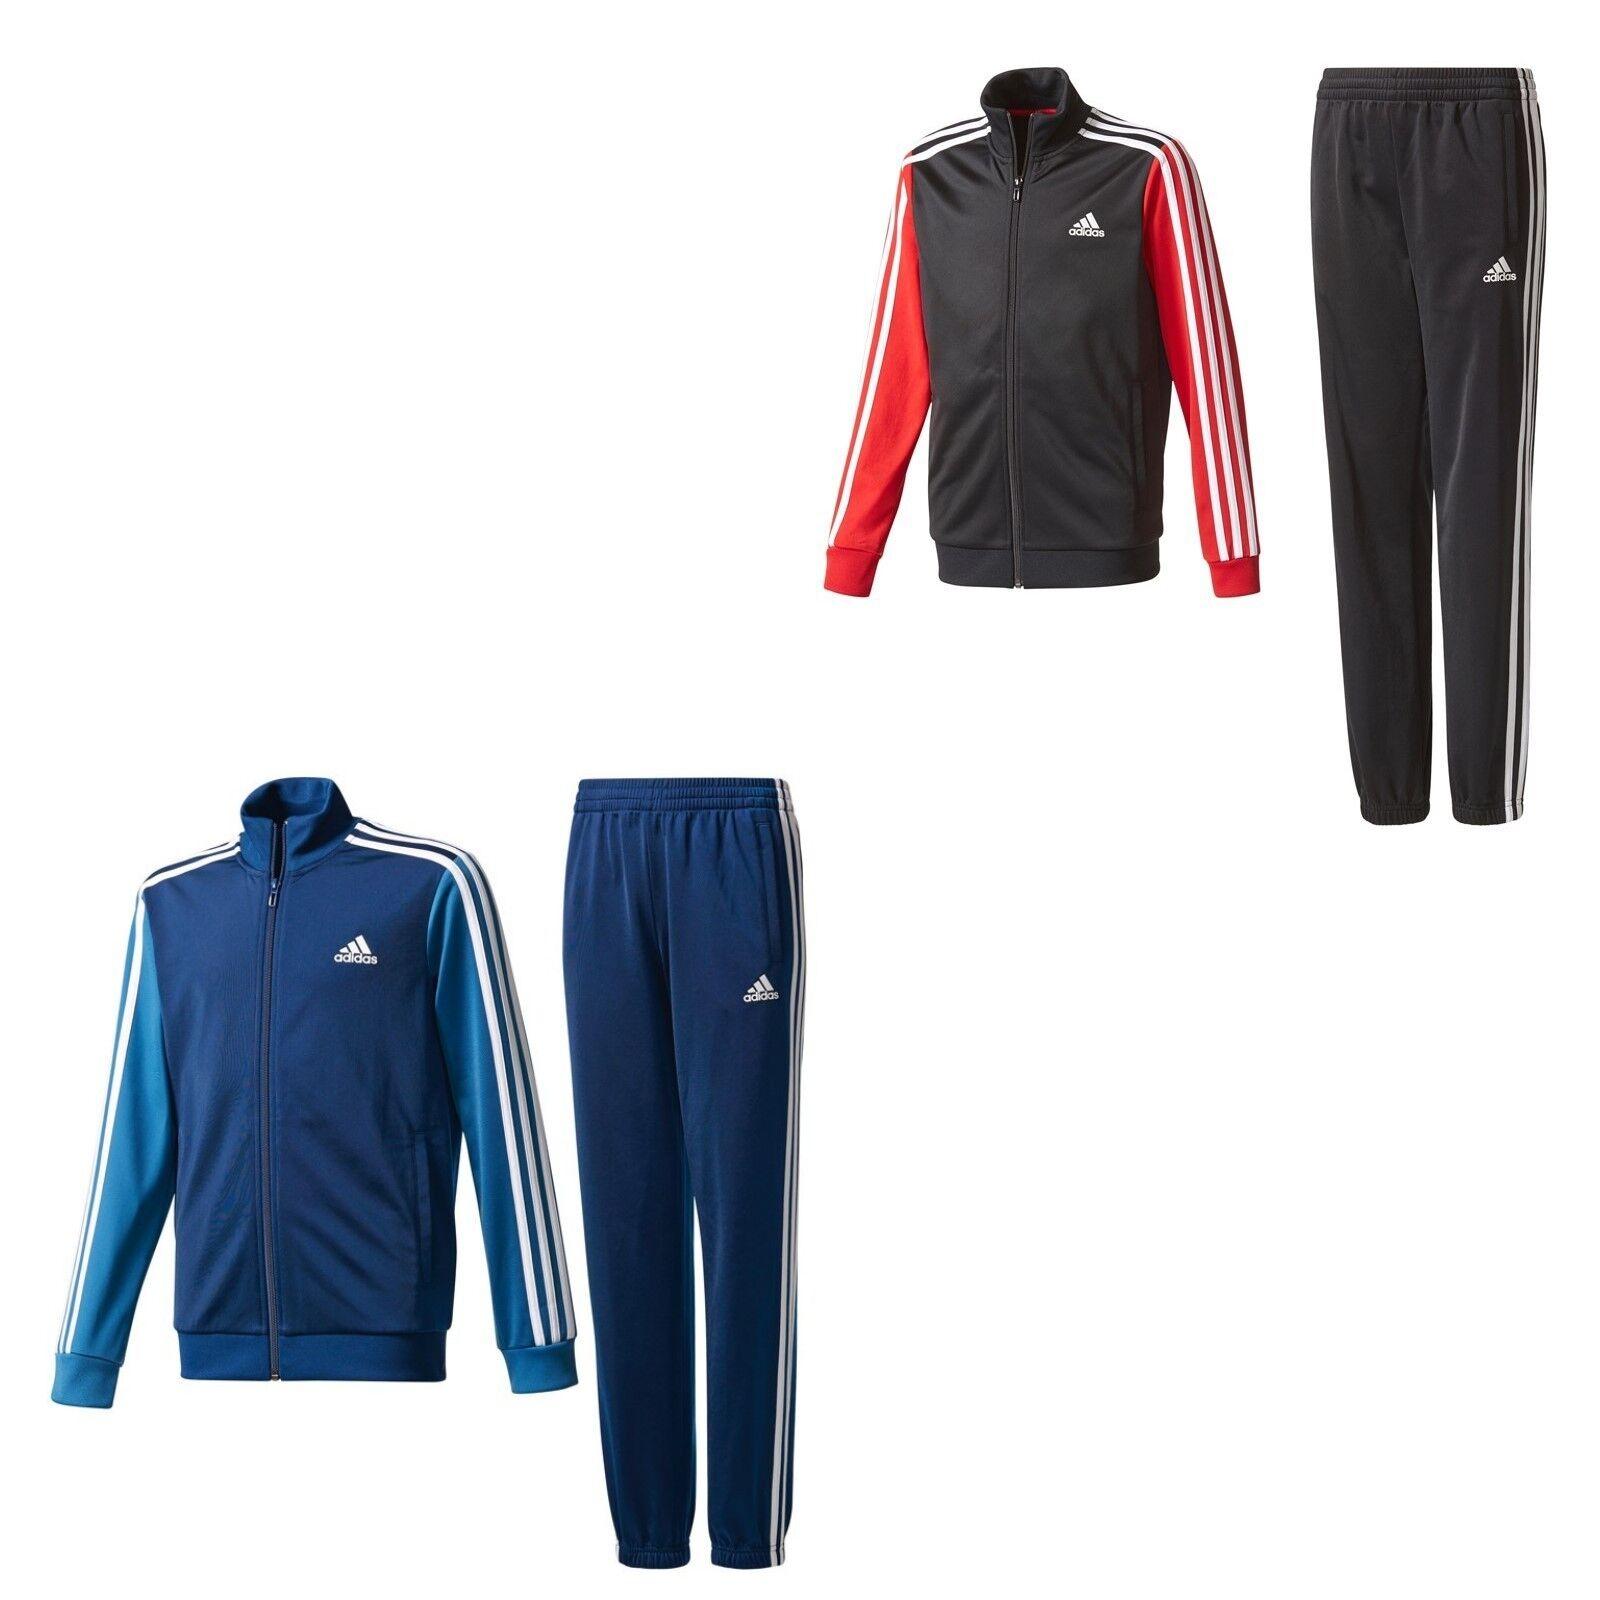 Adidas Tibero Trainingsanzug Sportanzug Jogginganzug für Kinder Junge Mädchen